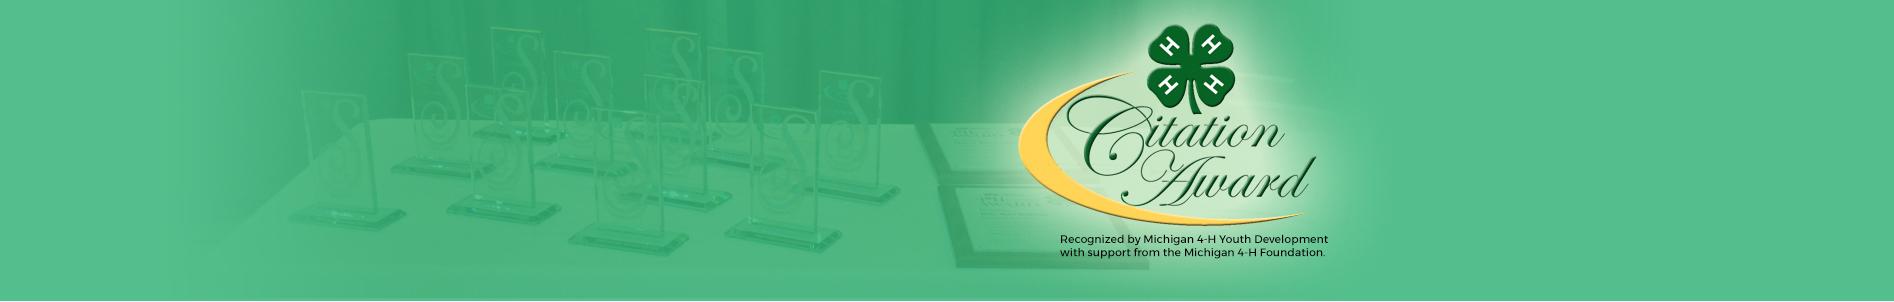 4-H Citation Award